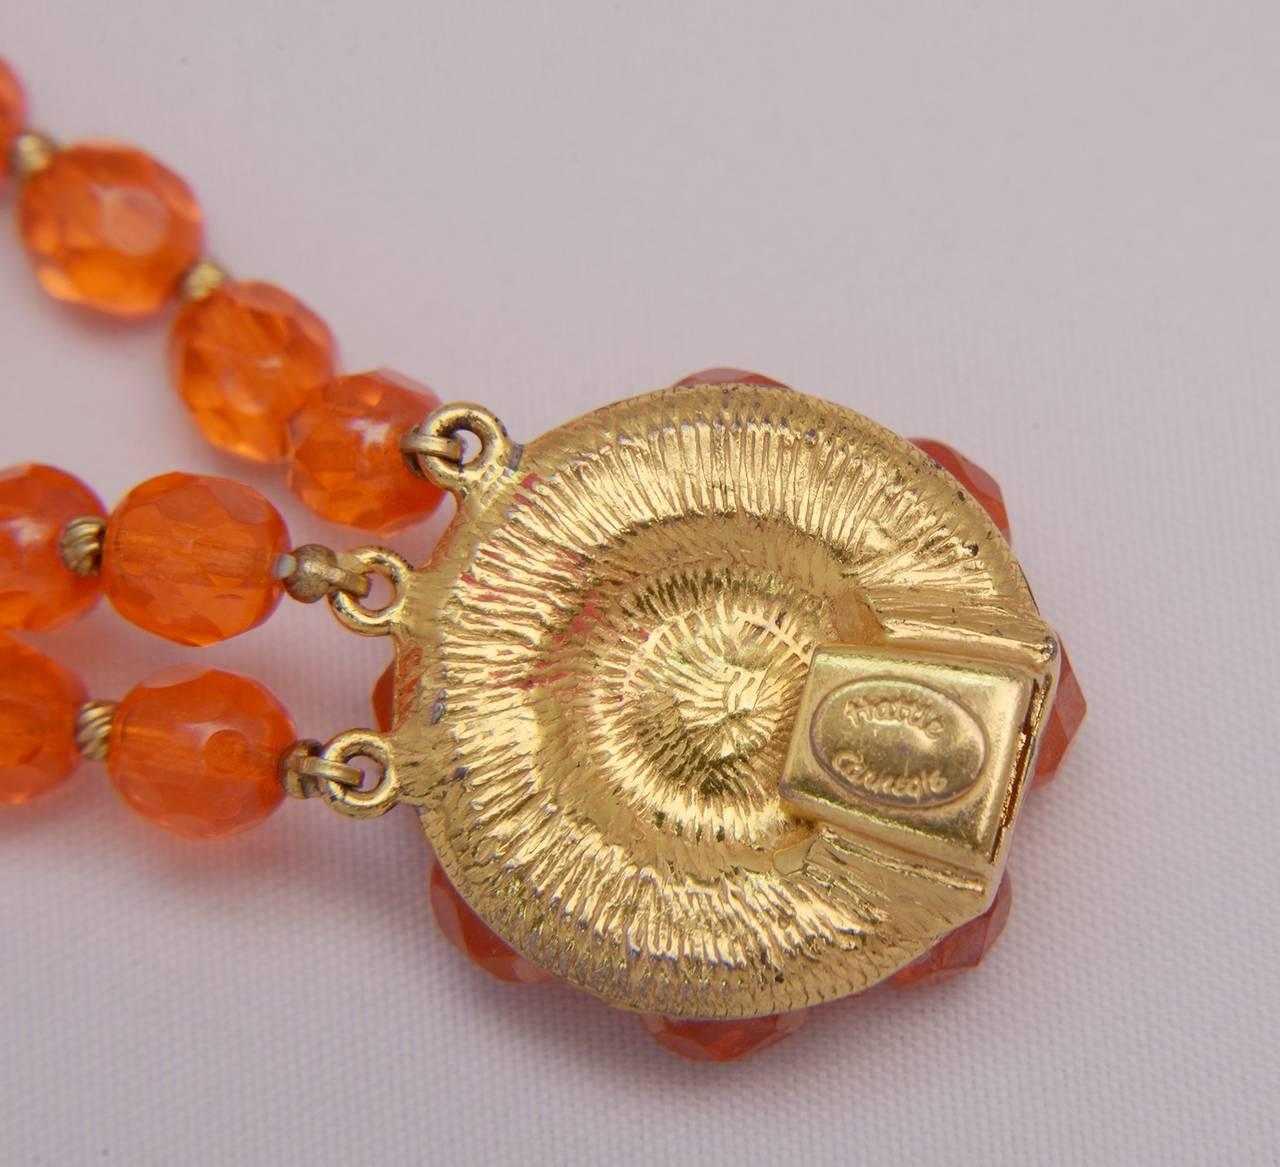 1960s Hattie Carnegie Tangerine Glass Bead Necklace and Earrings 3